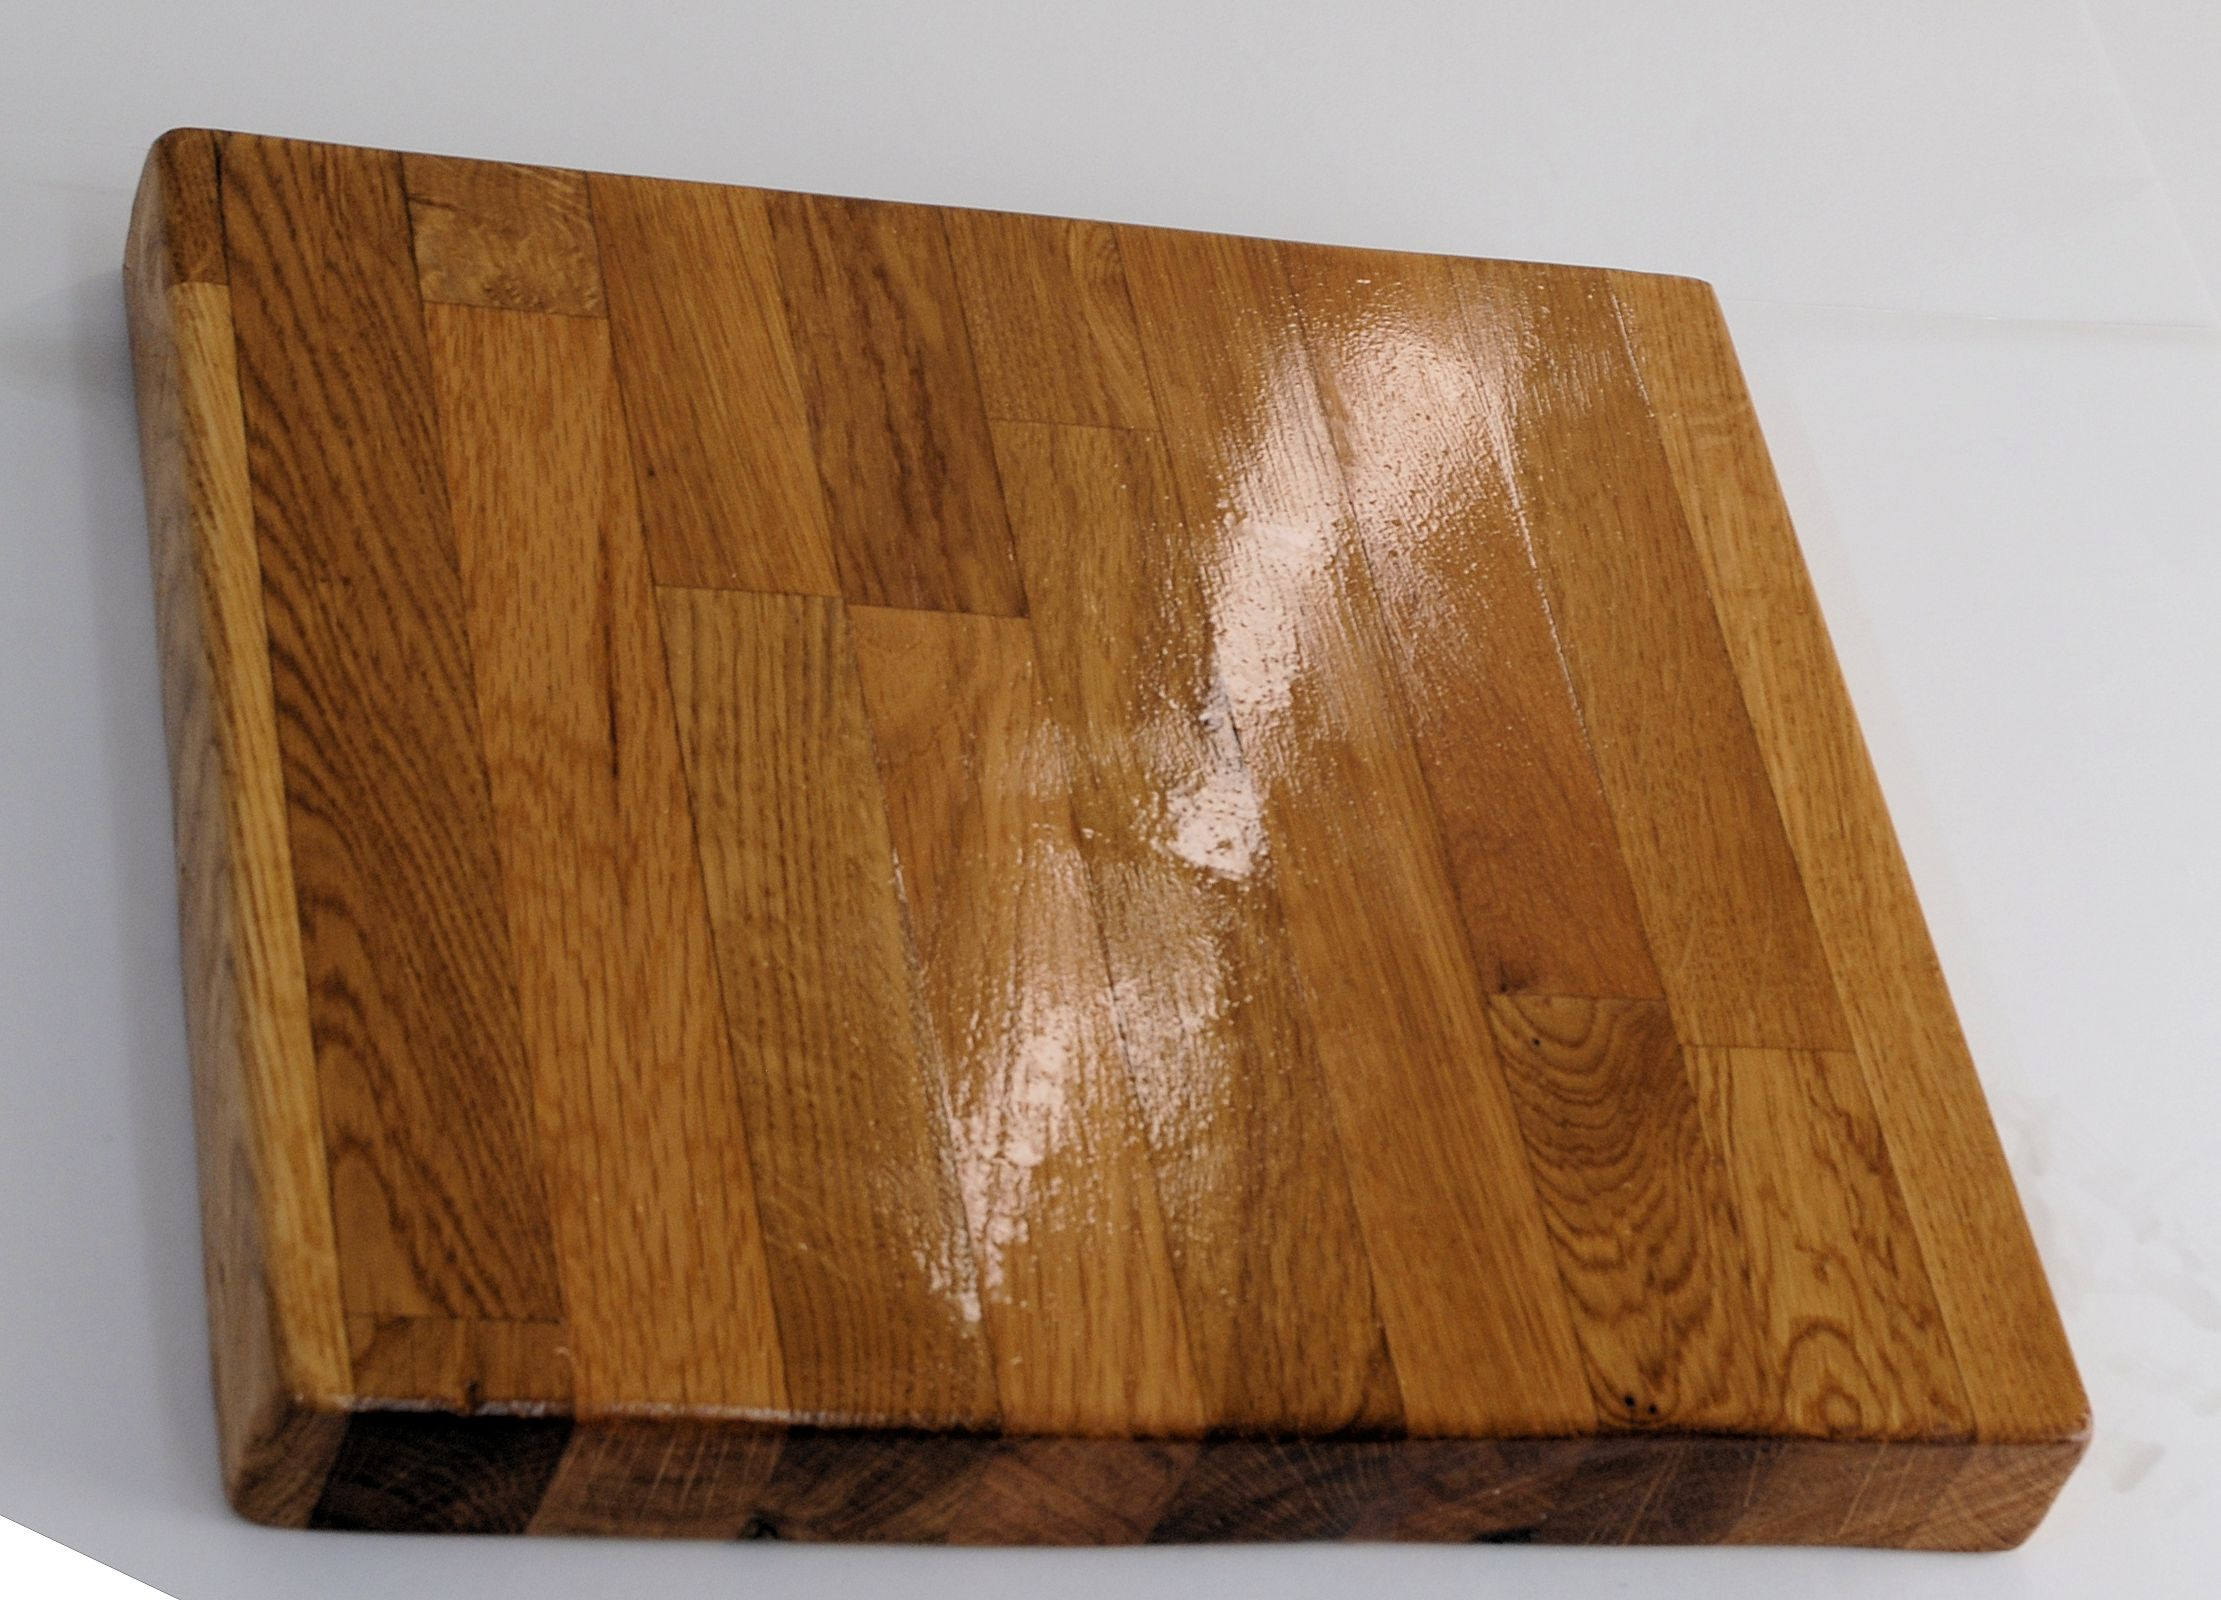 Danish Wood Oil PDF Woodworking